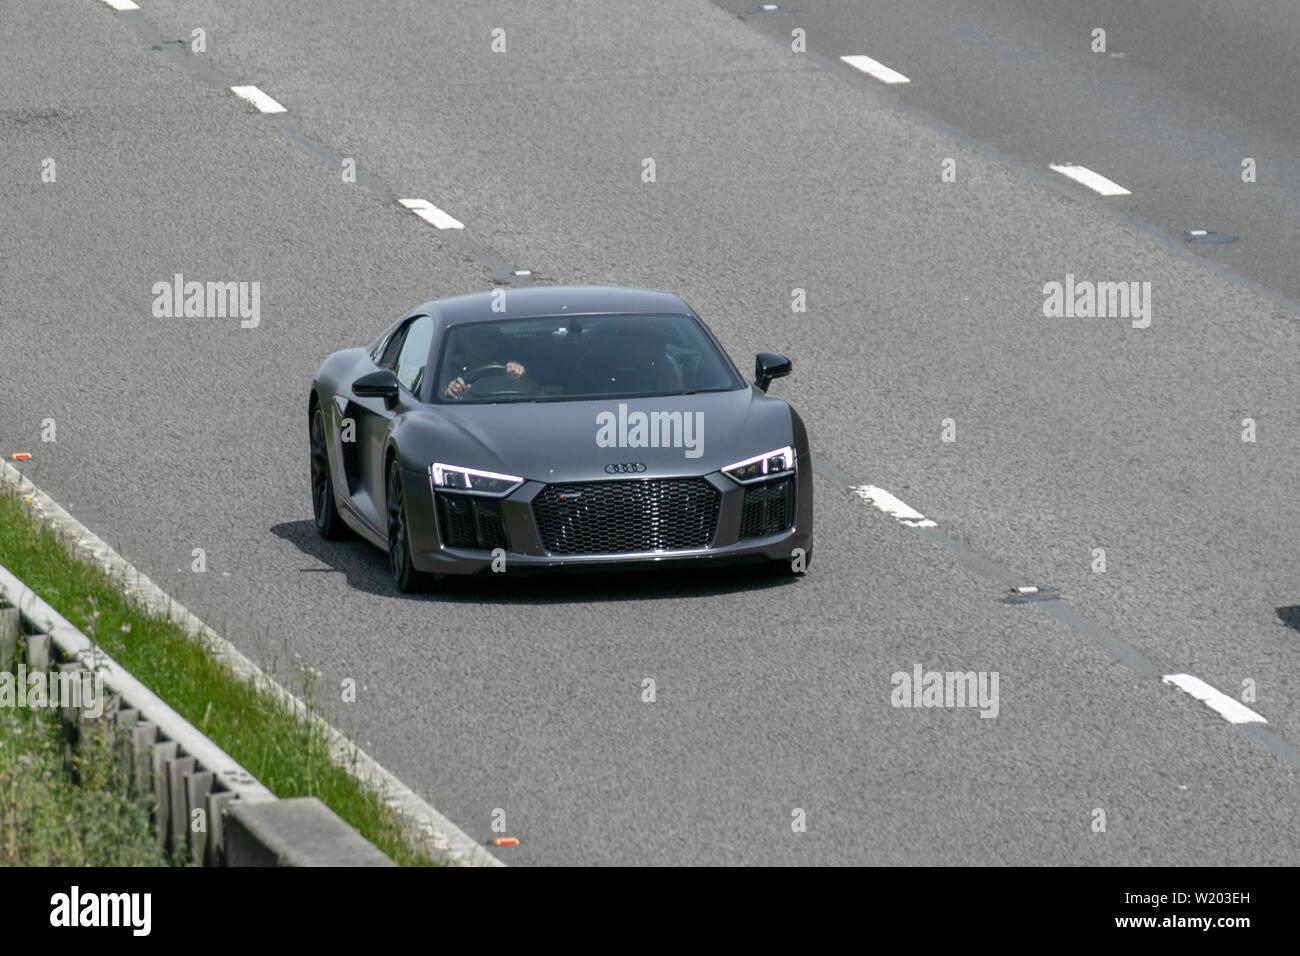 High-end Luxury Audi R8 Sports car;UK Vehicular traffic, transport, modern, saloon cars, north-bound on the 3 lane M6 motorway highway. - Stock Image